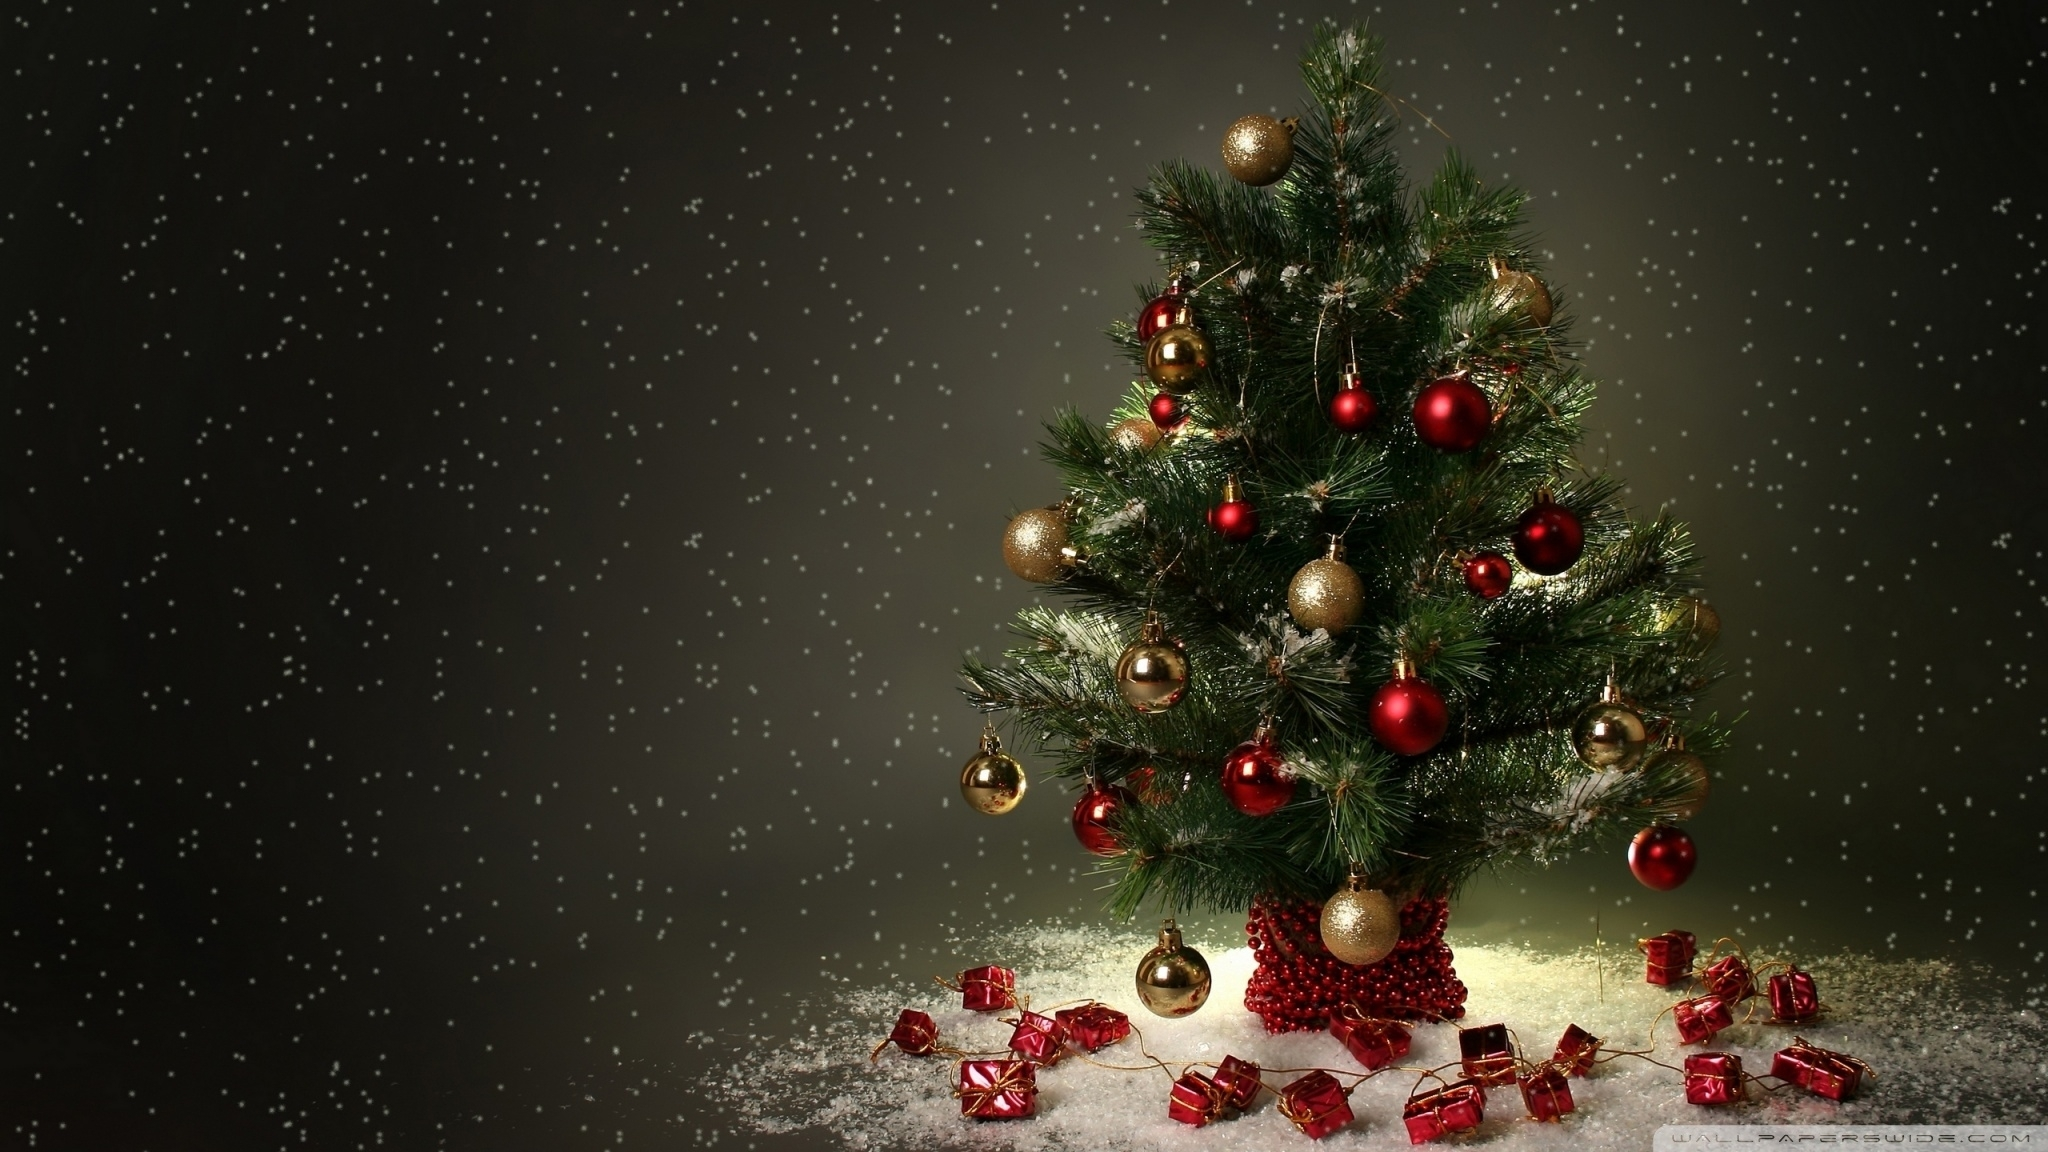 small christmas tree ❤ 4k hd desktop wallpaper for 4k ultra hd tv